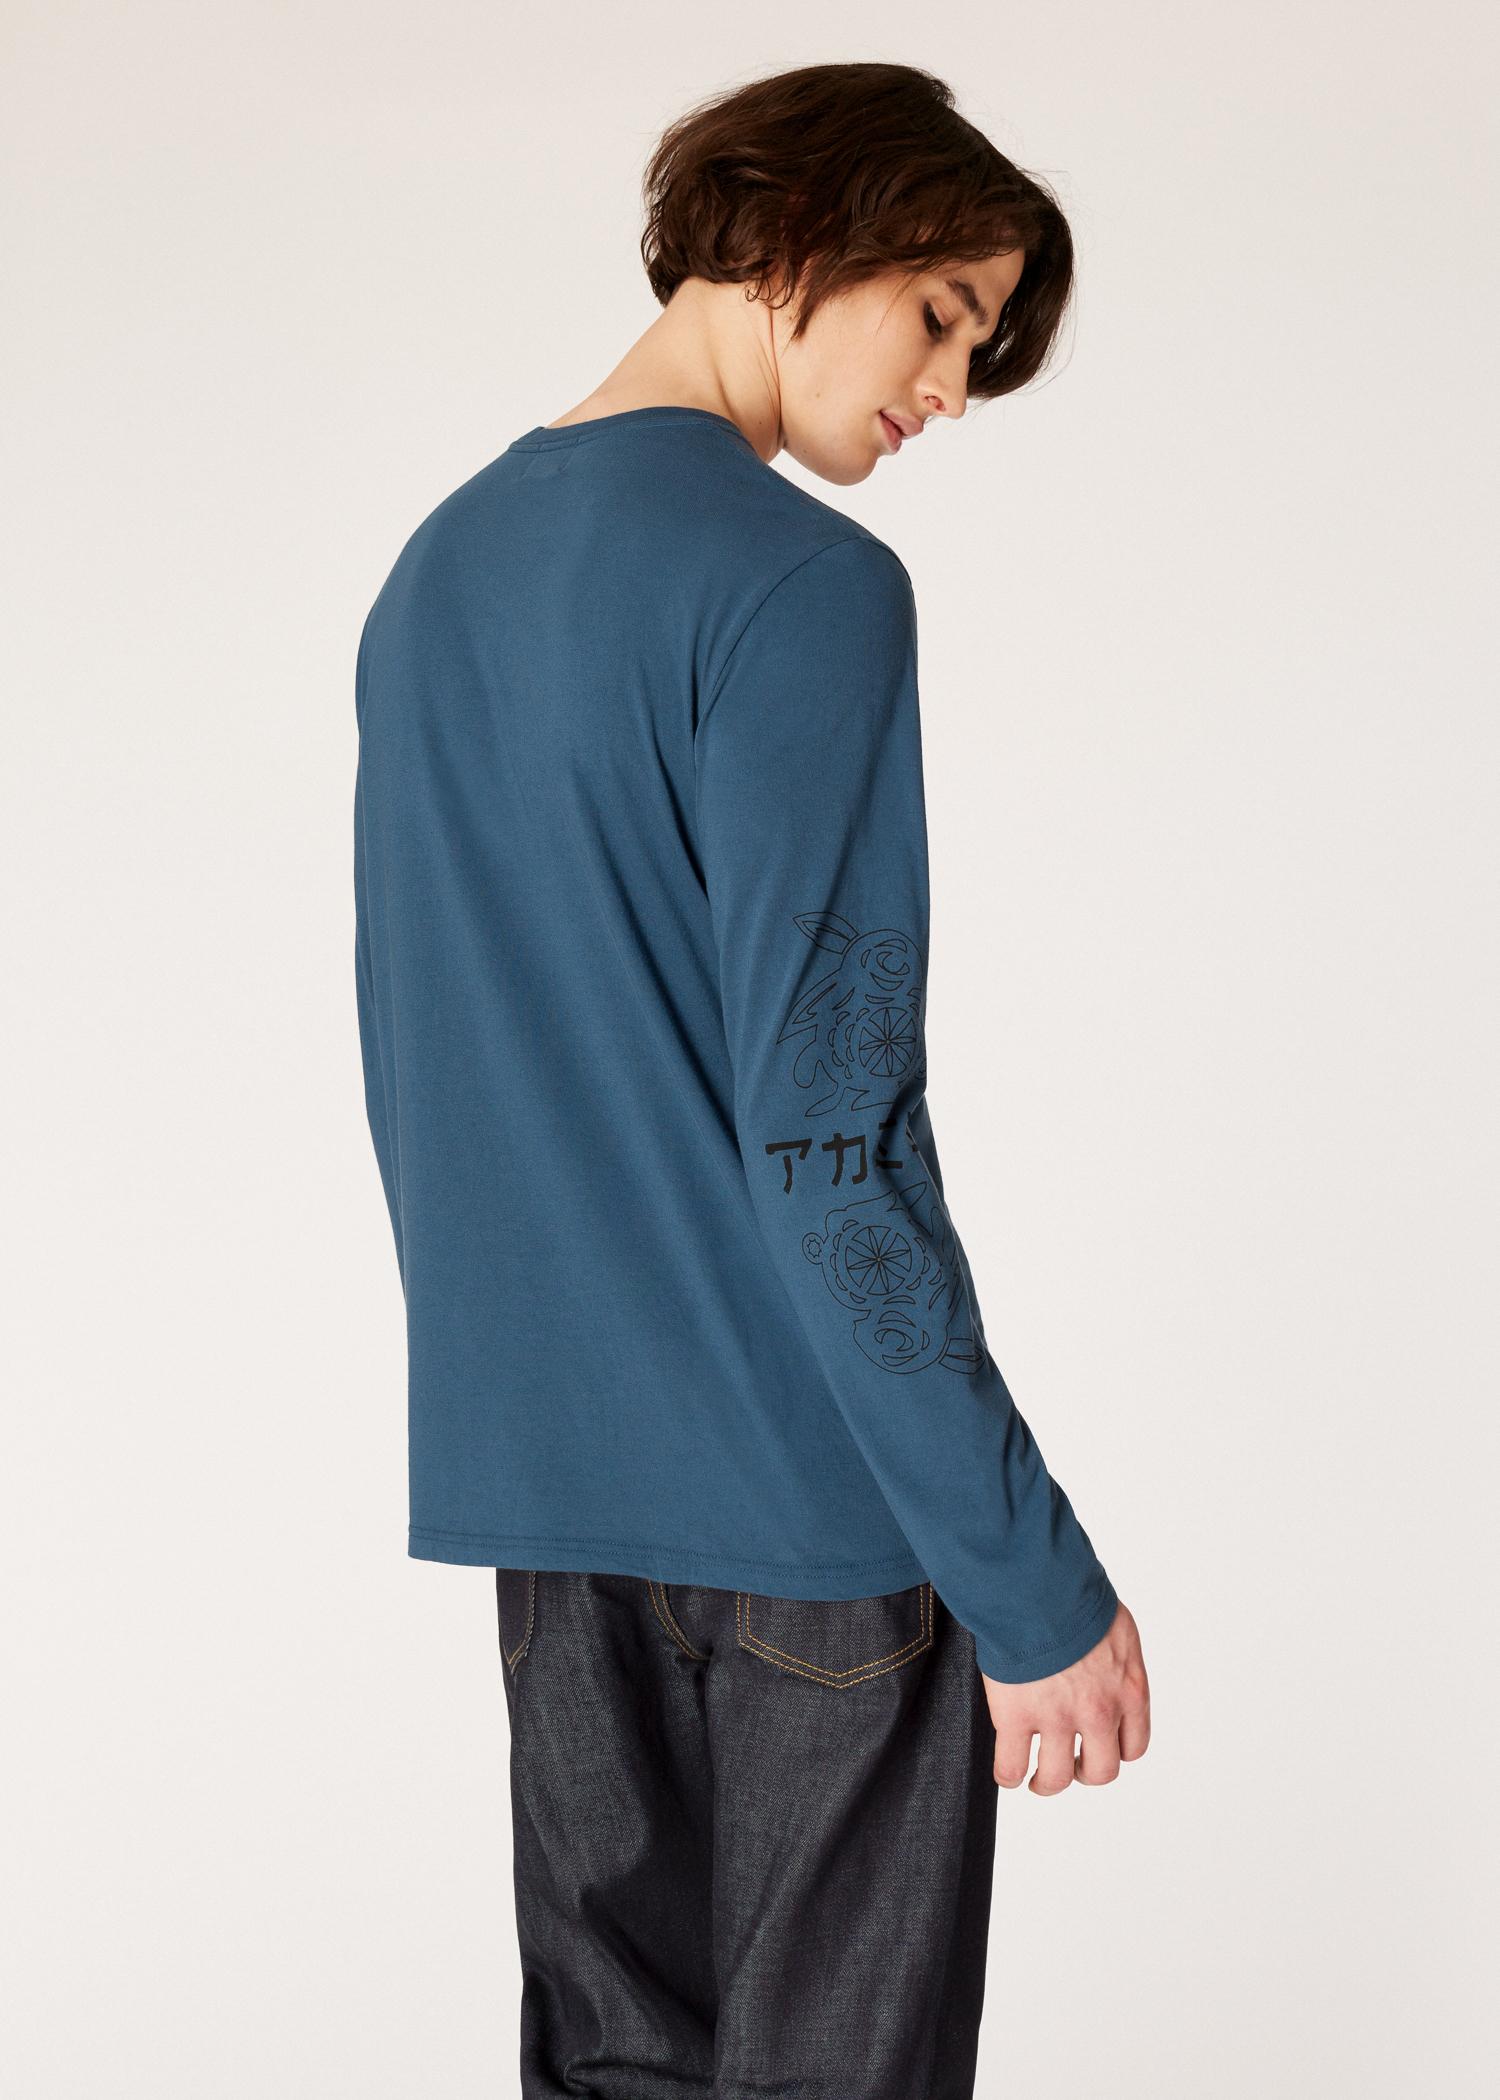 5b7d85db8ddd Men's Slate Blue Long-Sleeve Red Ear T-Shirt With 'Mirrored Rabbit ...